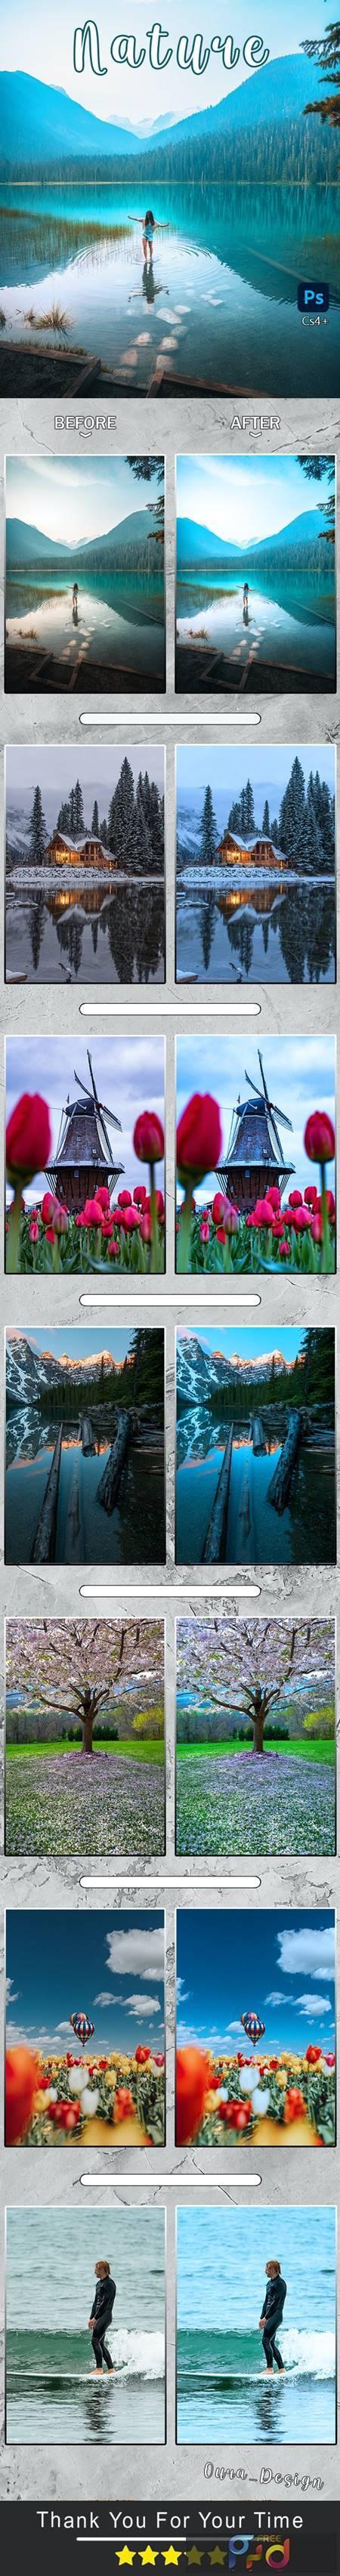 Nature Photoshop Action 30893496 1